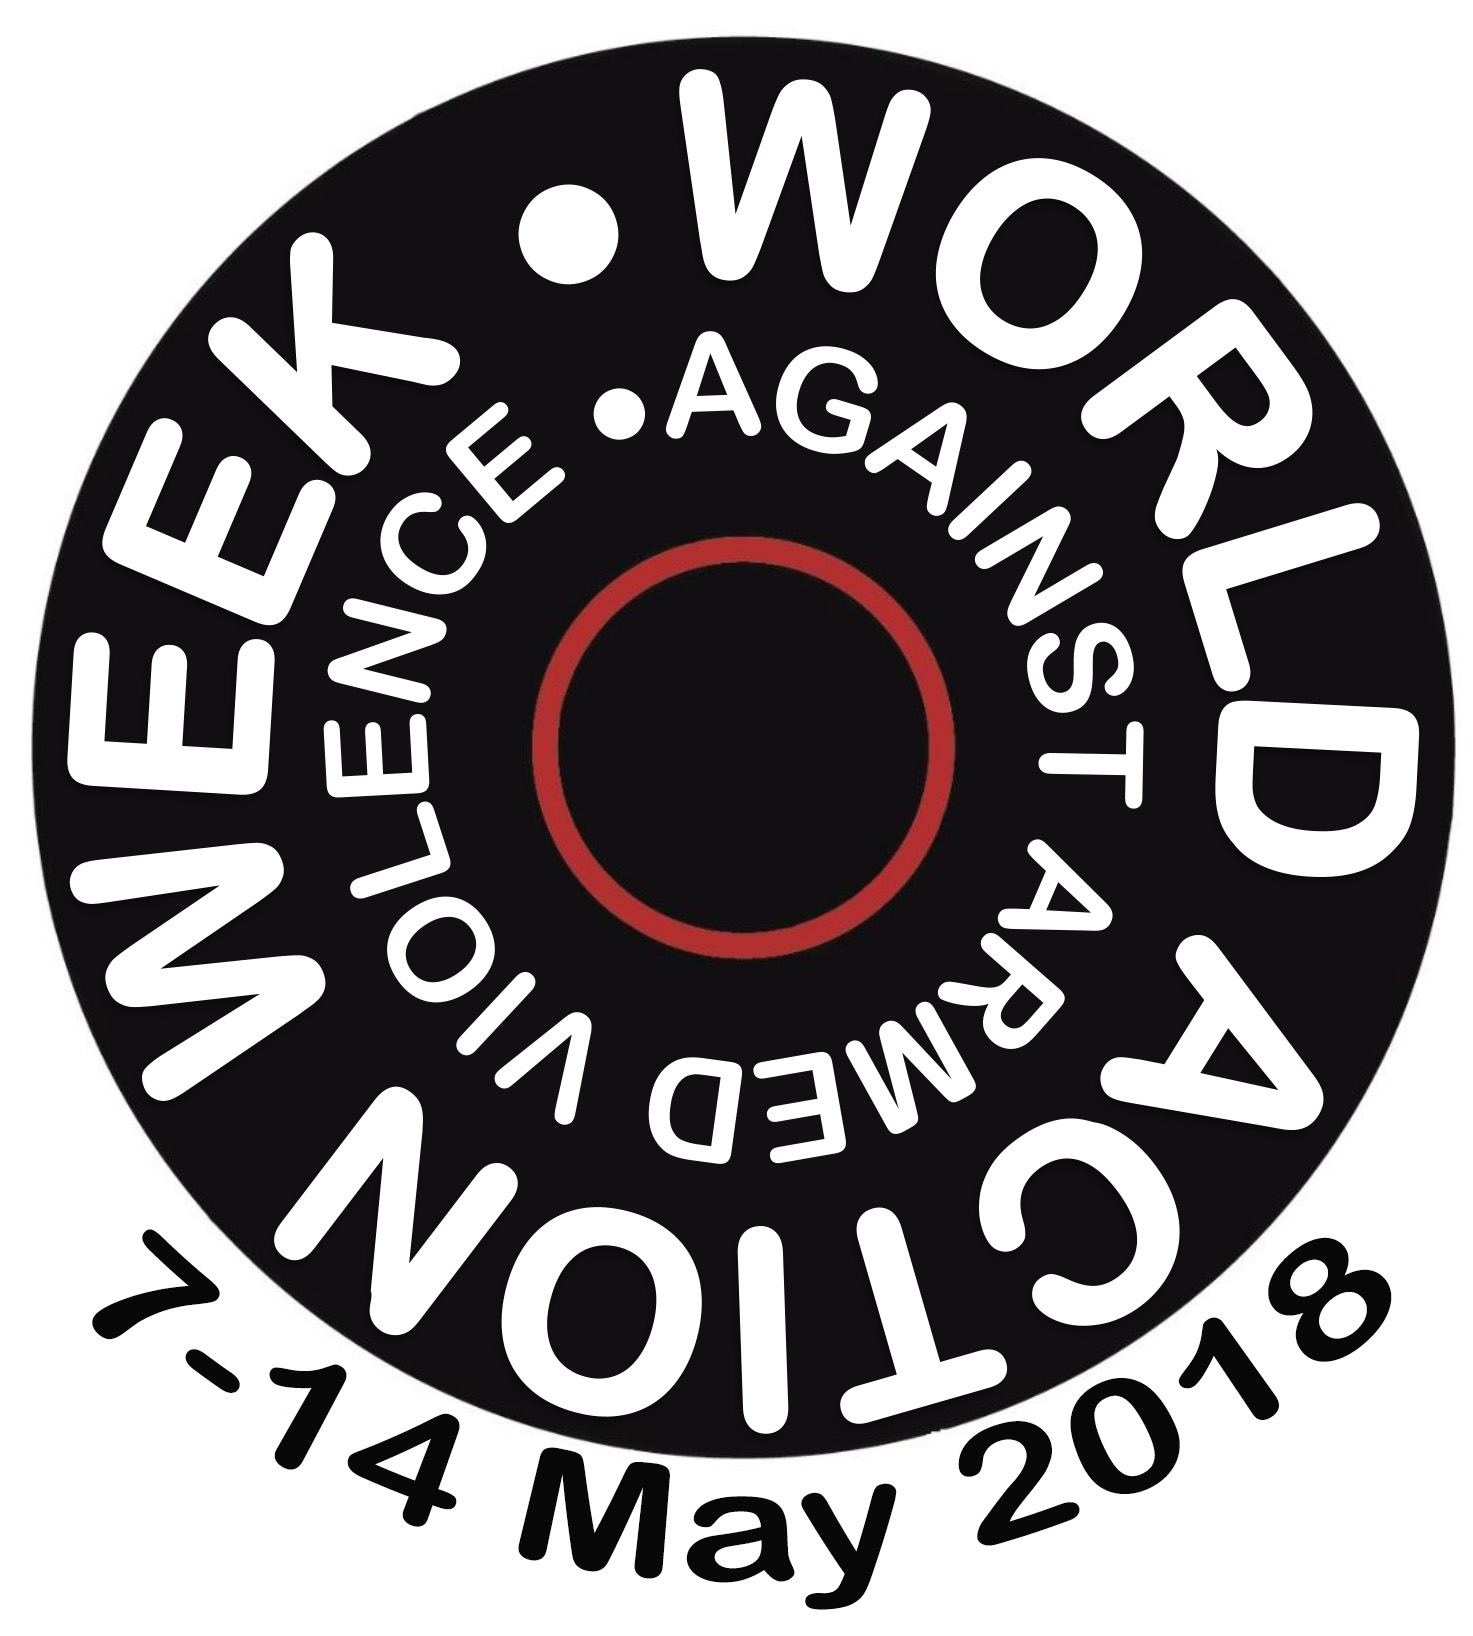 Aktionswoche gegen Waffengewalt, 7. bis 14. Mai